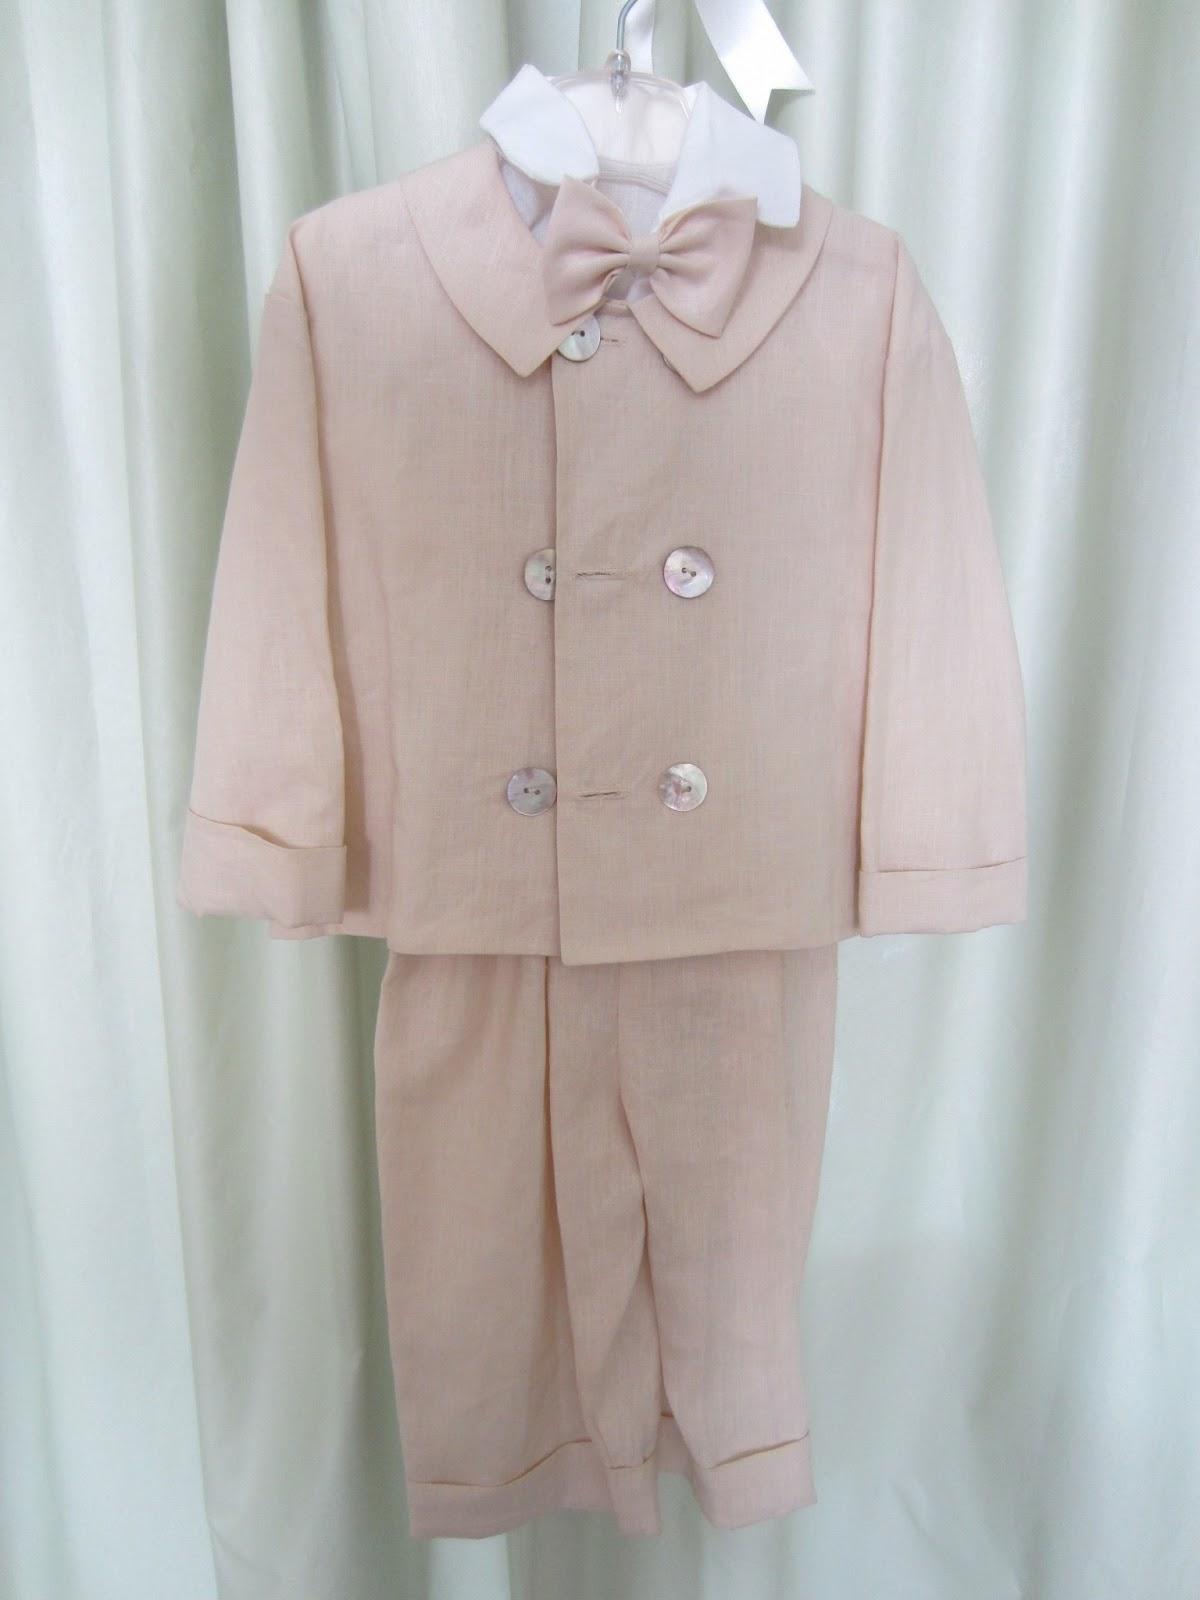 d7f7745af5b Παντελόνι, πουκάμισο, παπιόν, σακάκι και καπέλο, λινά. Νο 2. Τιμή: 40 ευρώ.